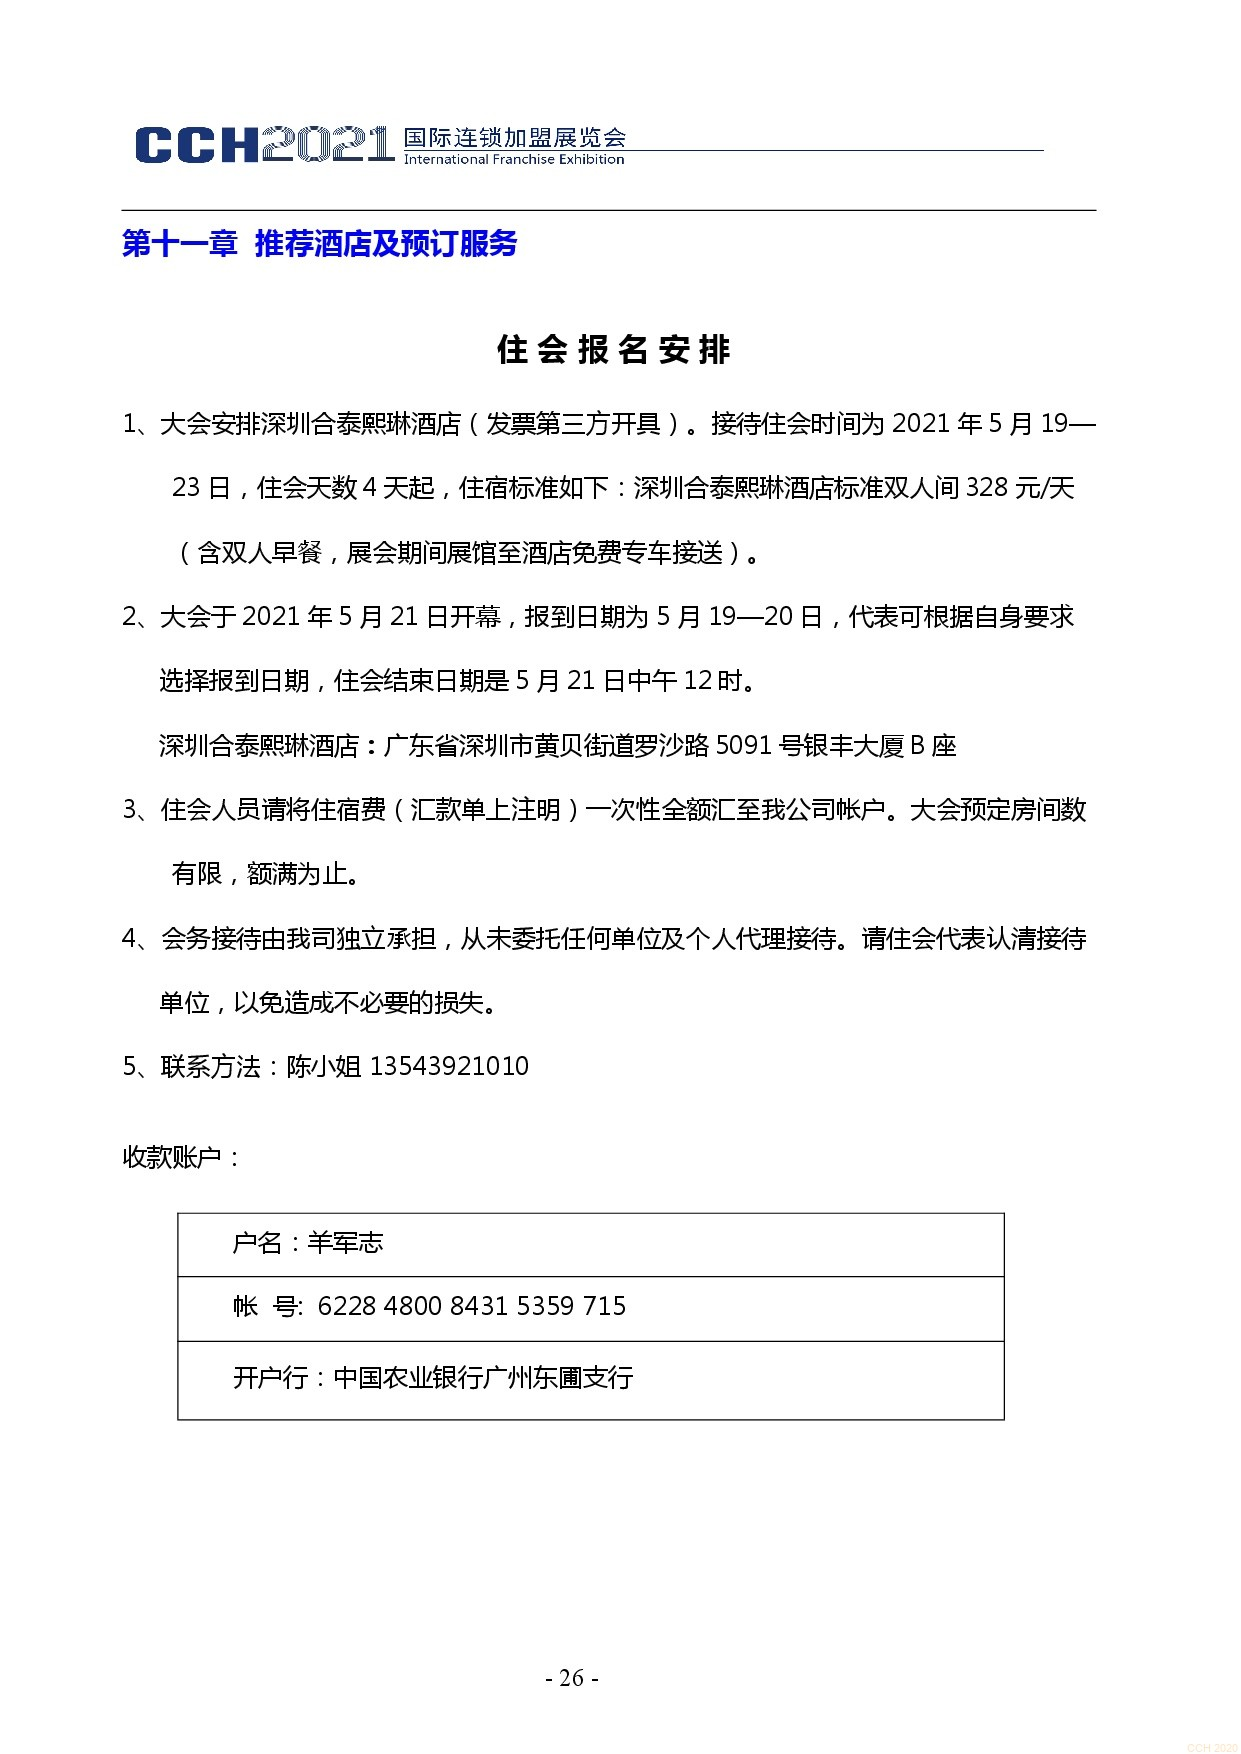 0416CCH深圳展参展商手册4.16-026.jpg